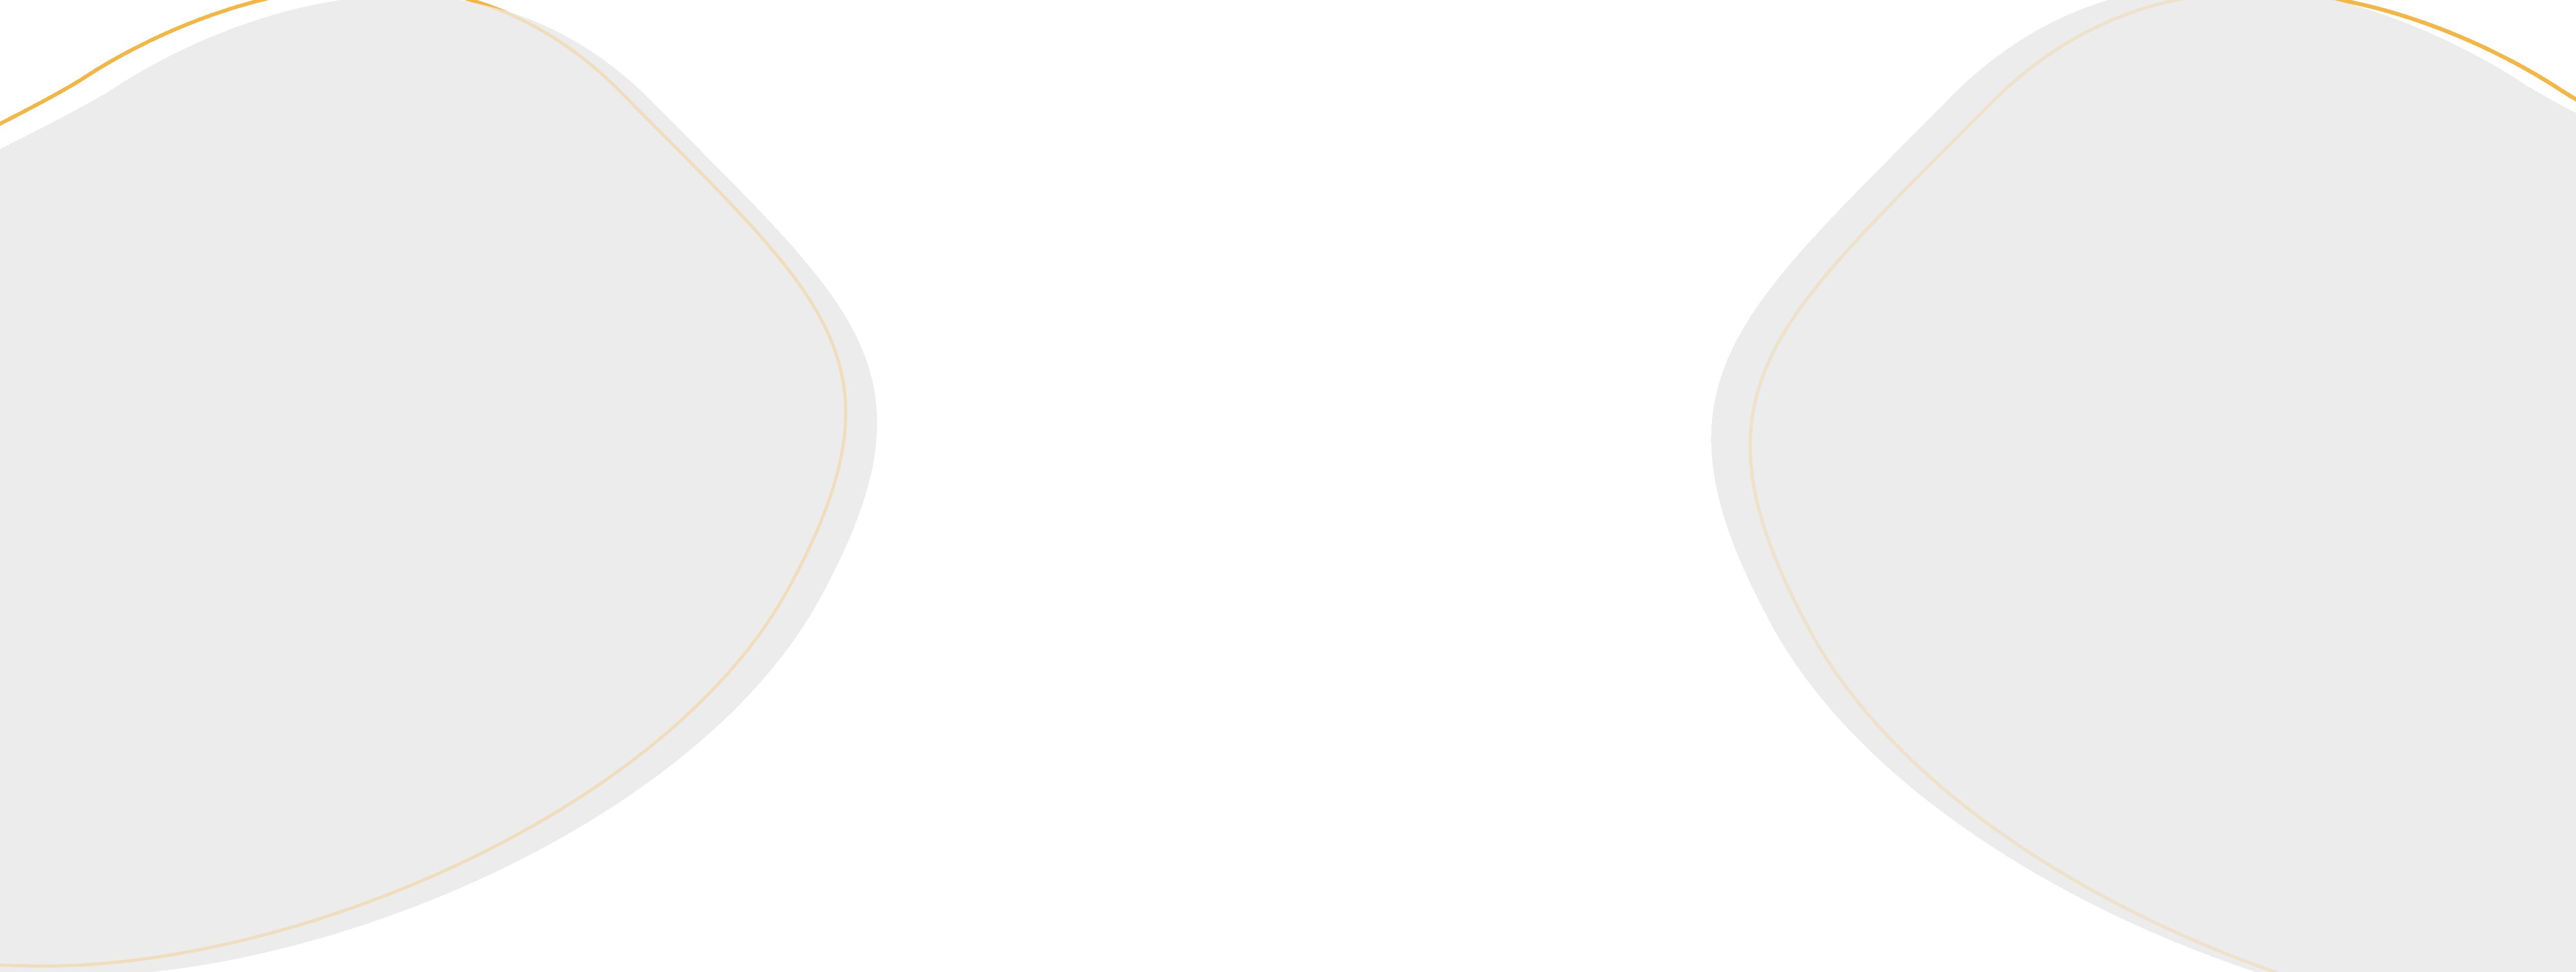 Benefits Blobs background image